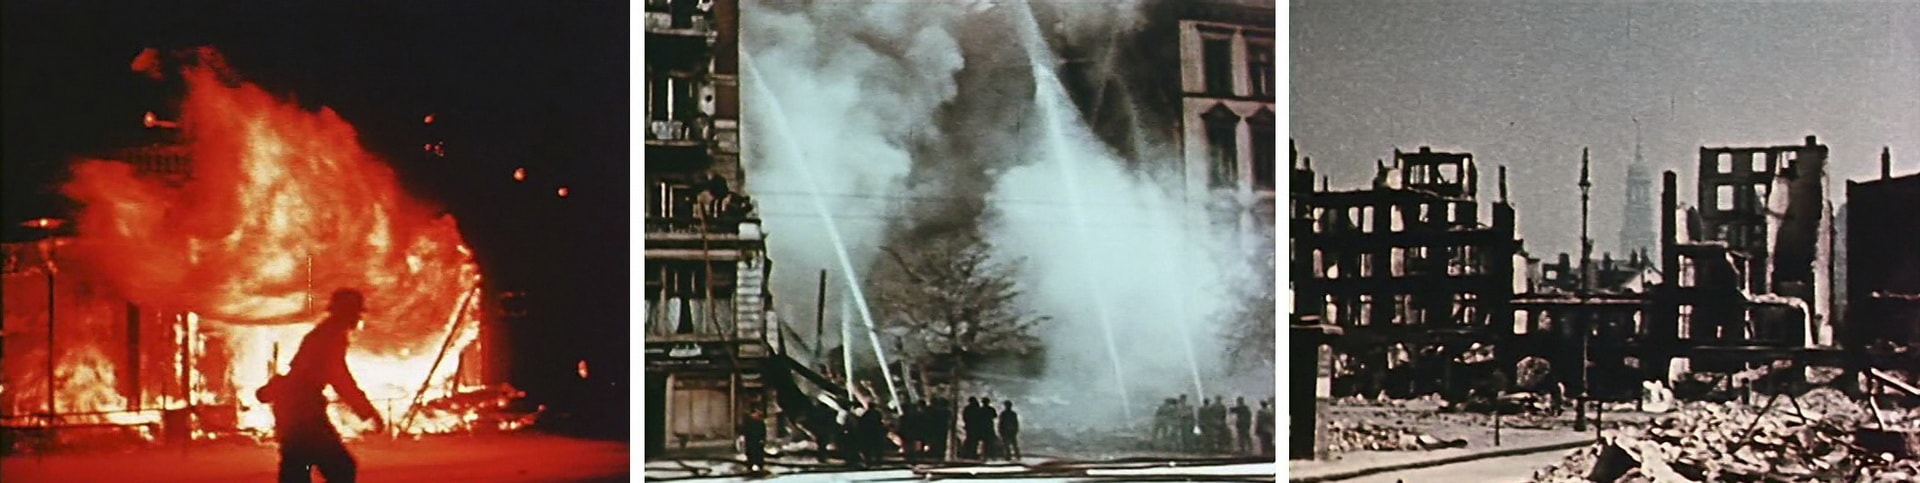 Бомбардировка Гамбурга август 1943 г. в цвете